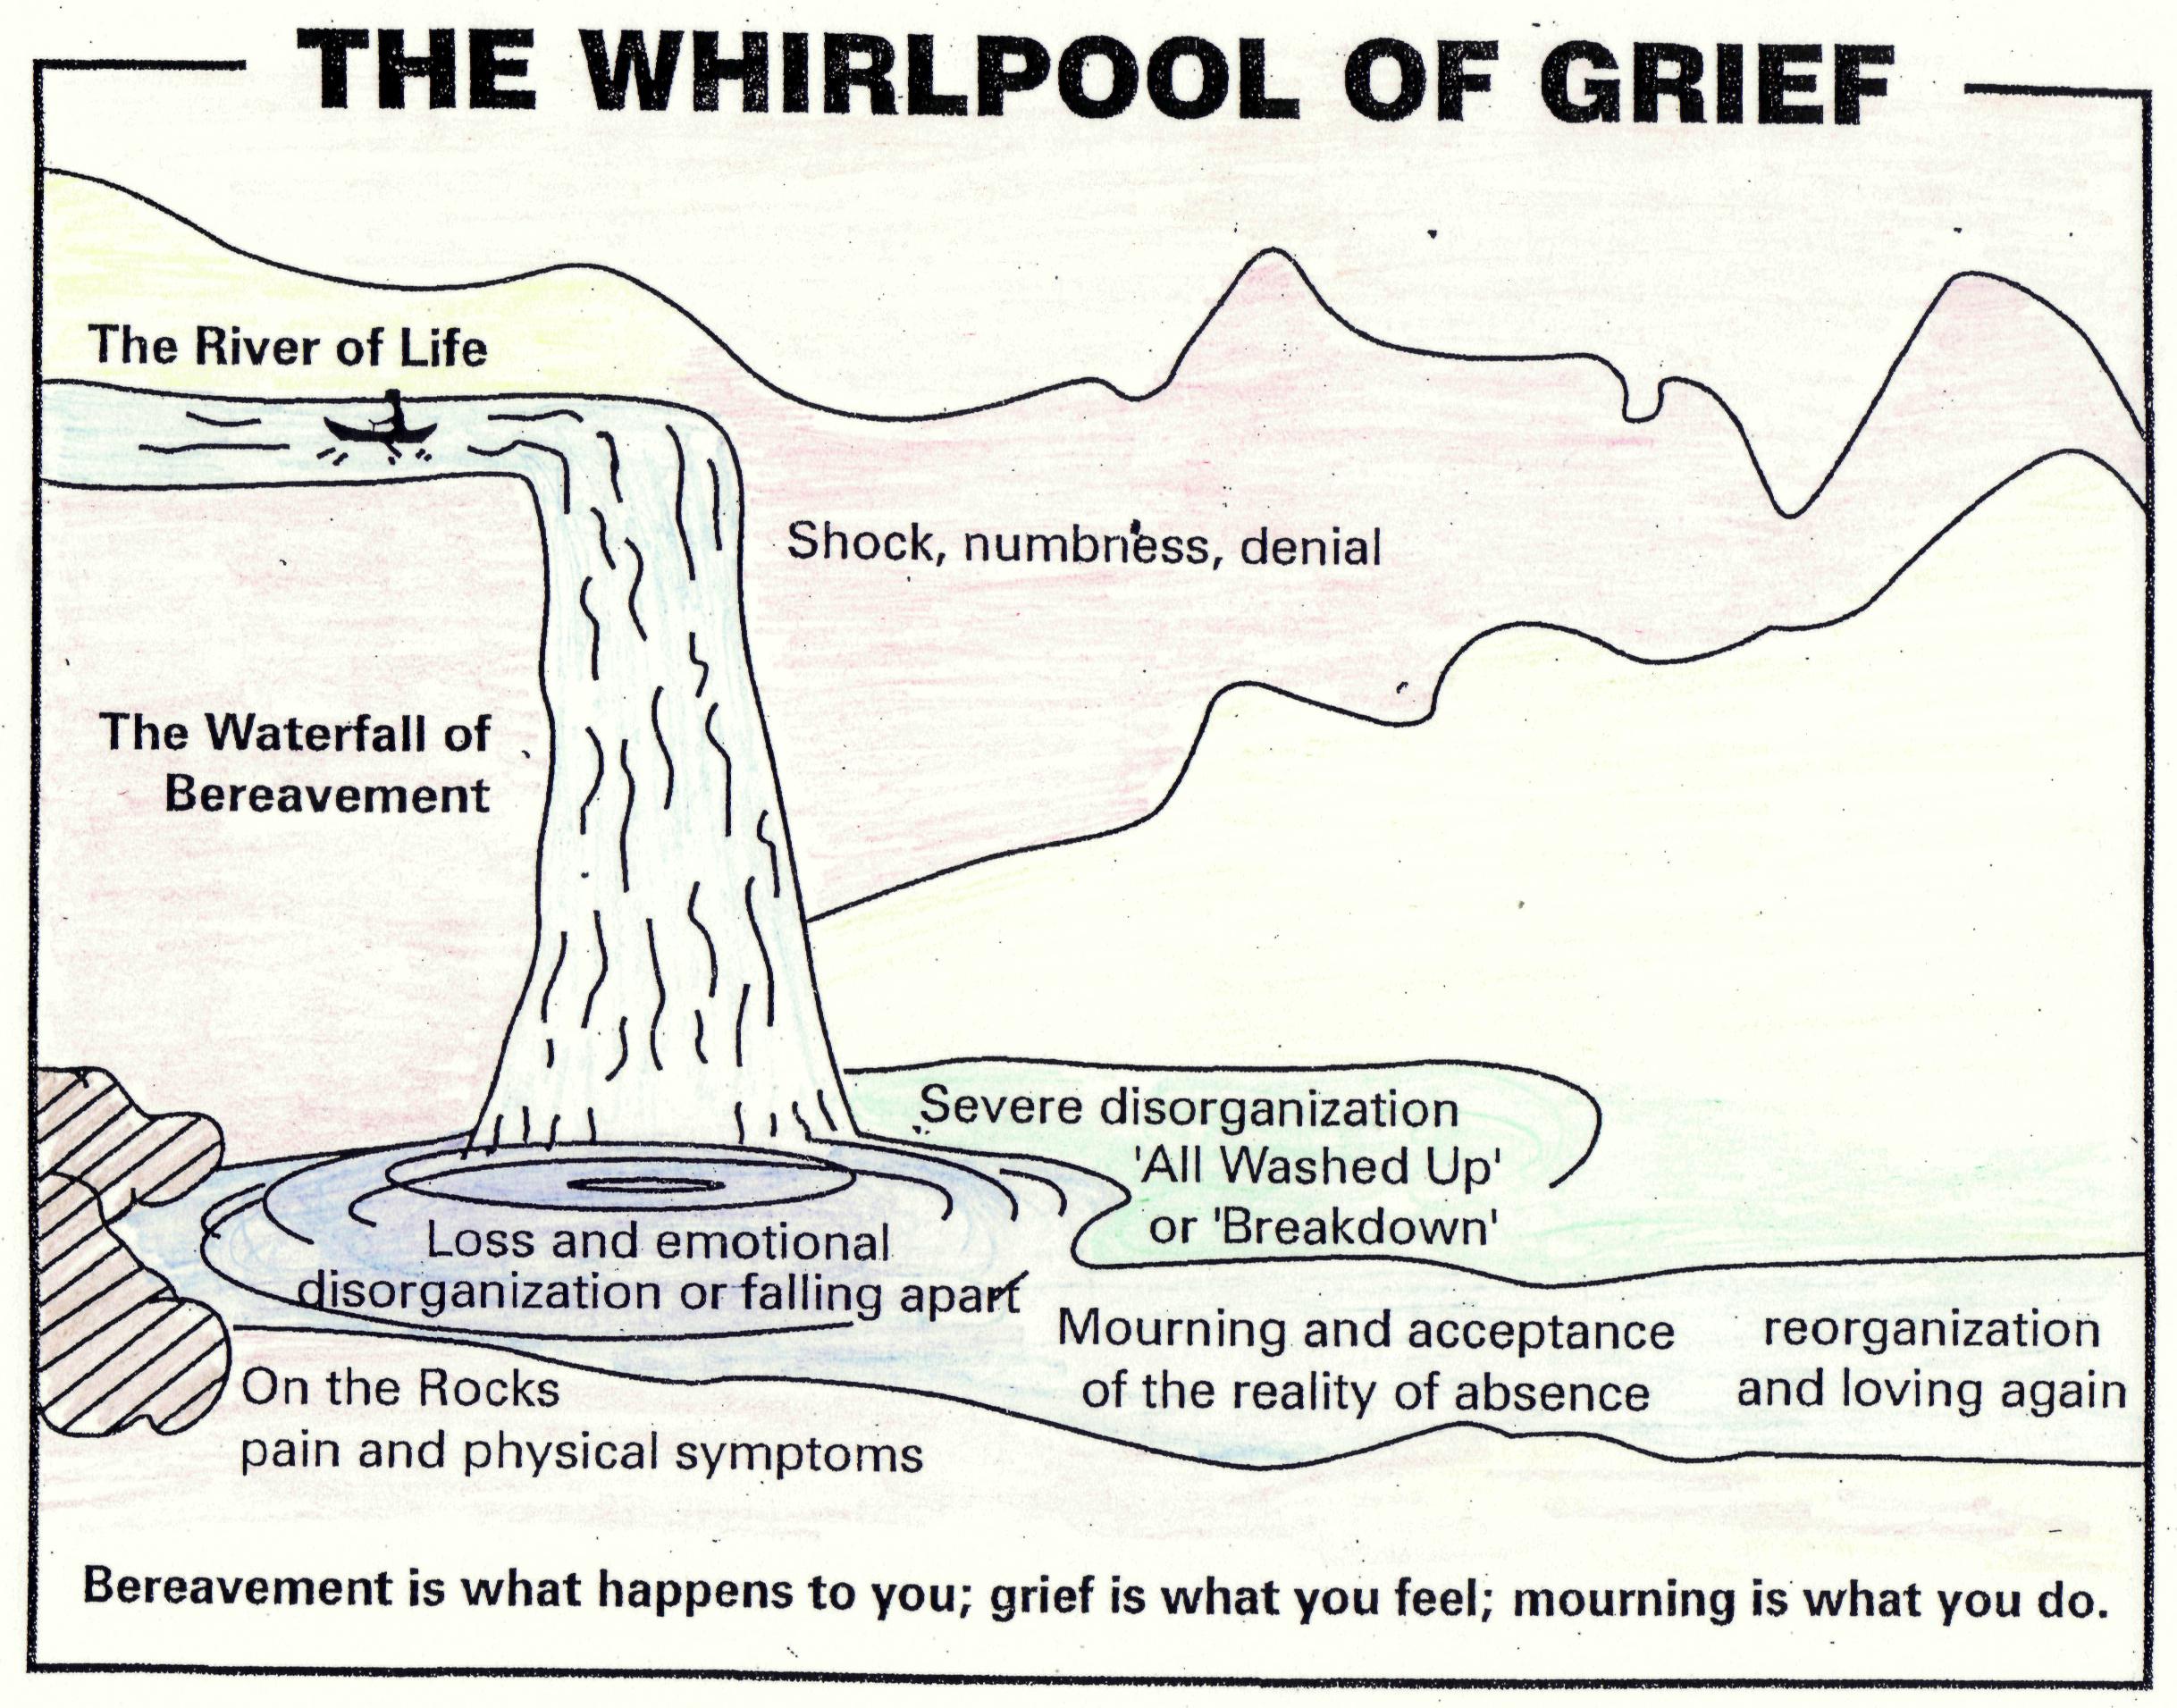 Bereavement Whirlpool Of Grief Bmp